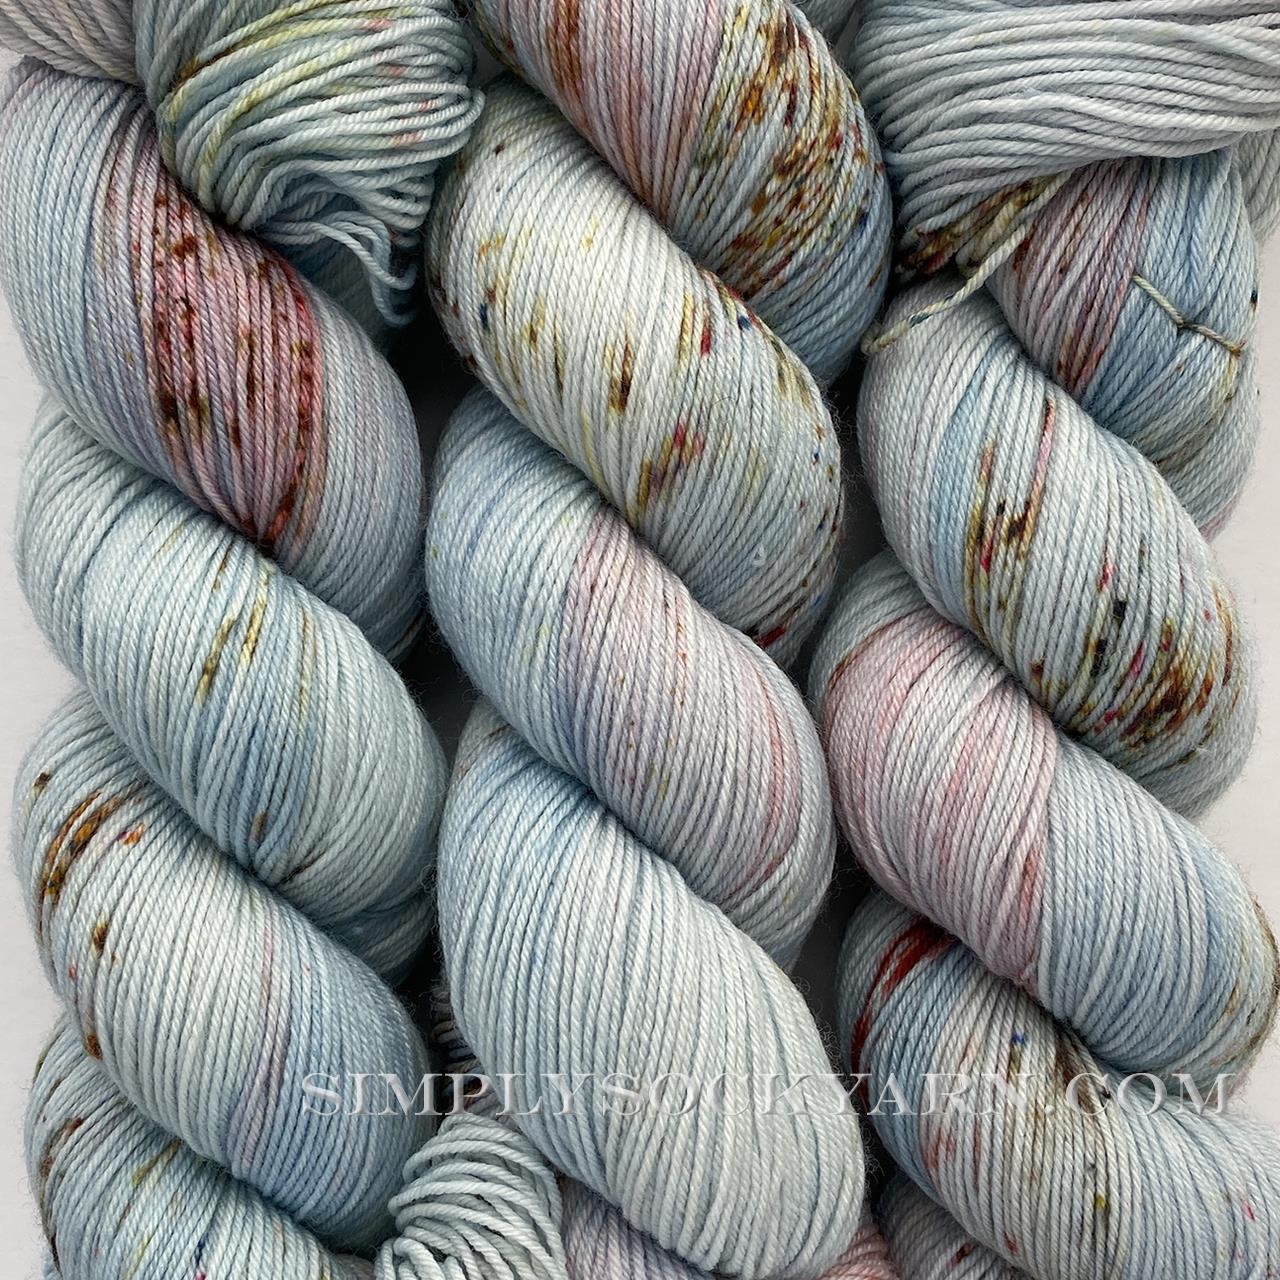 LITLG Sock Tin Shed -